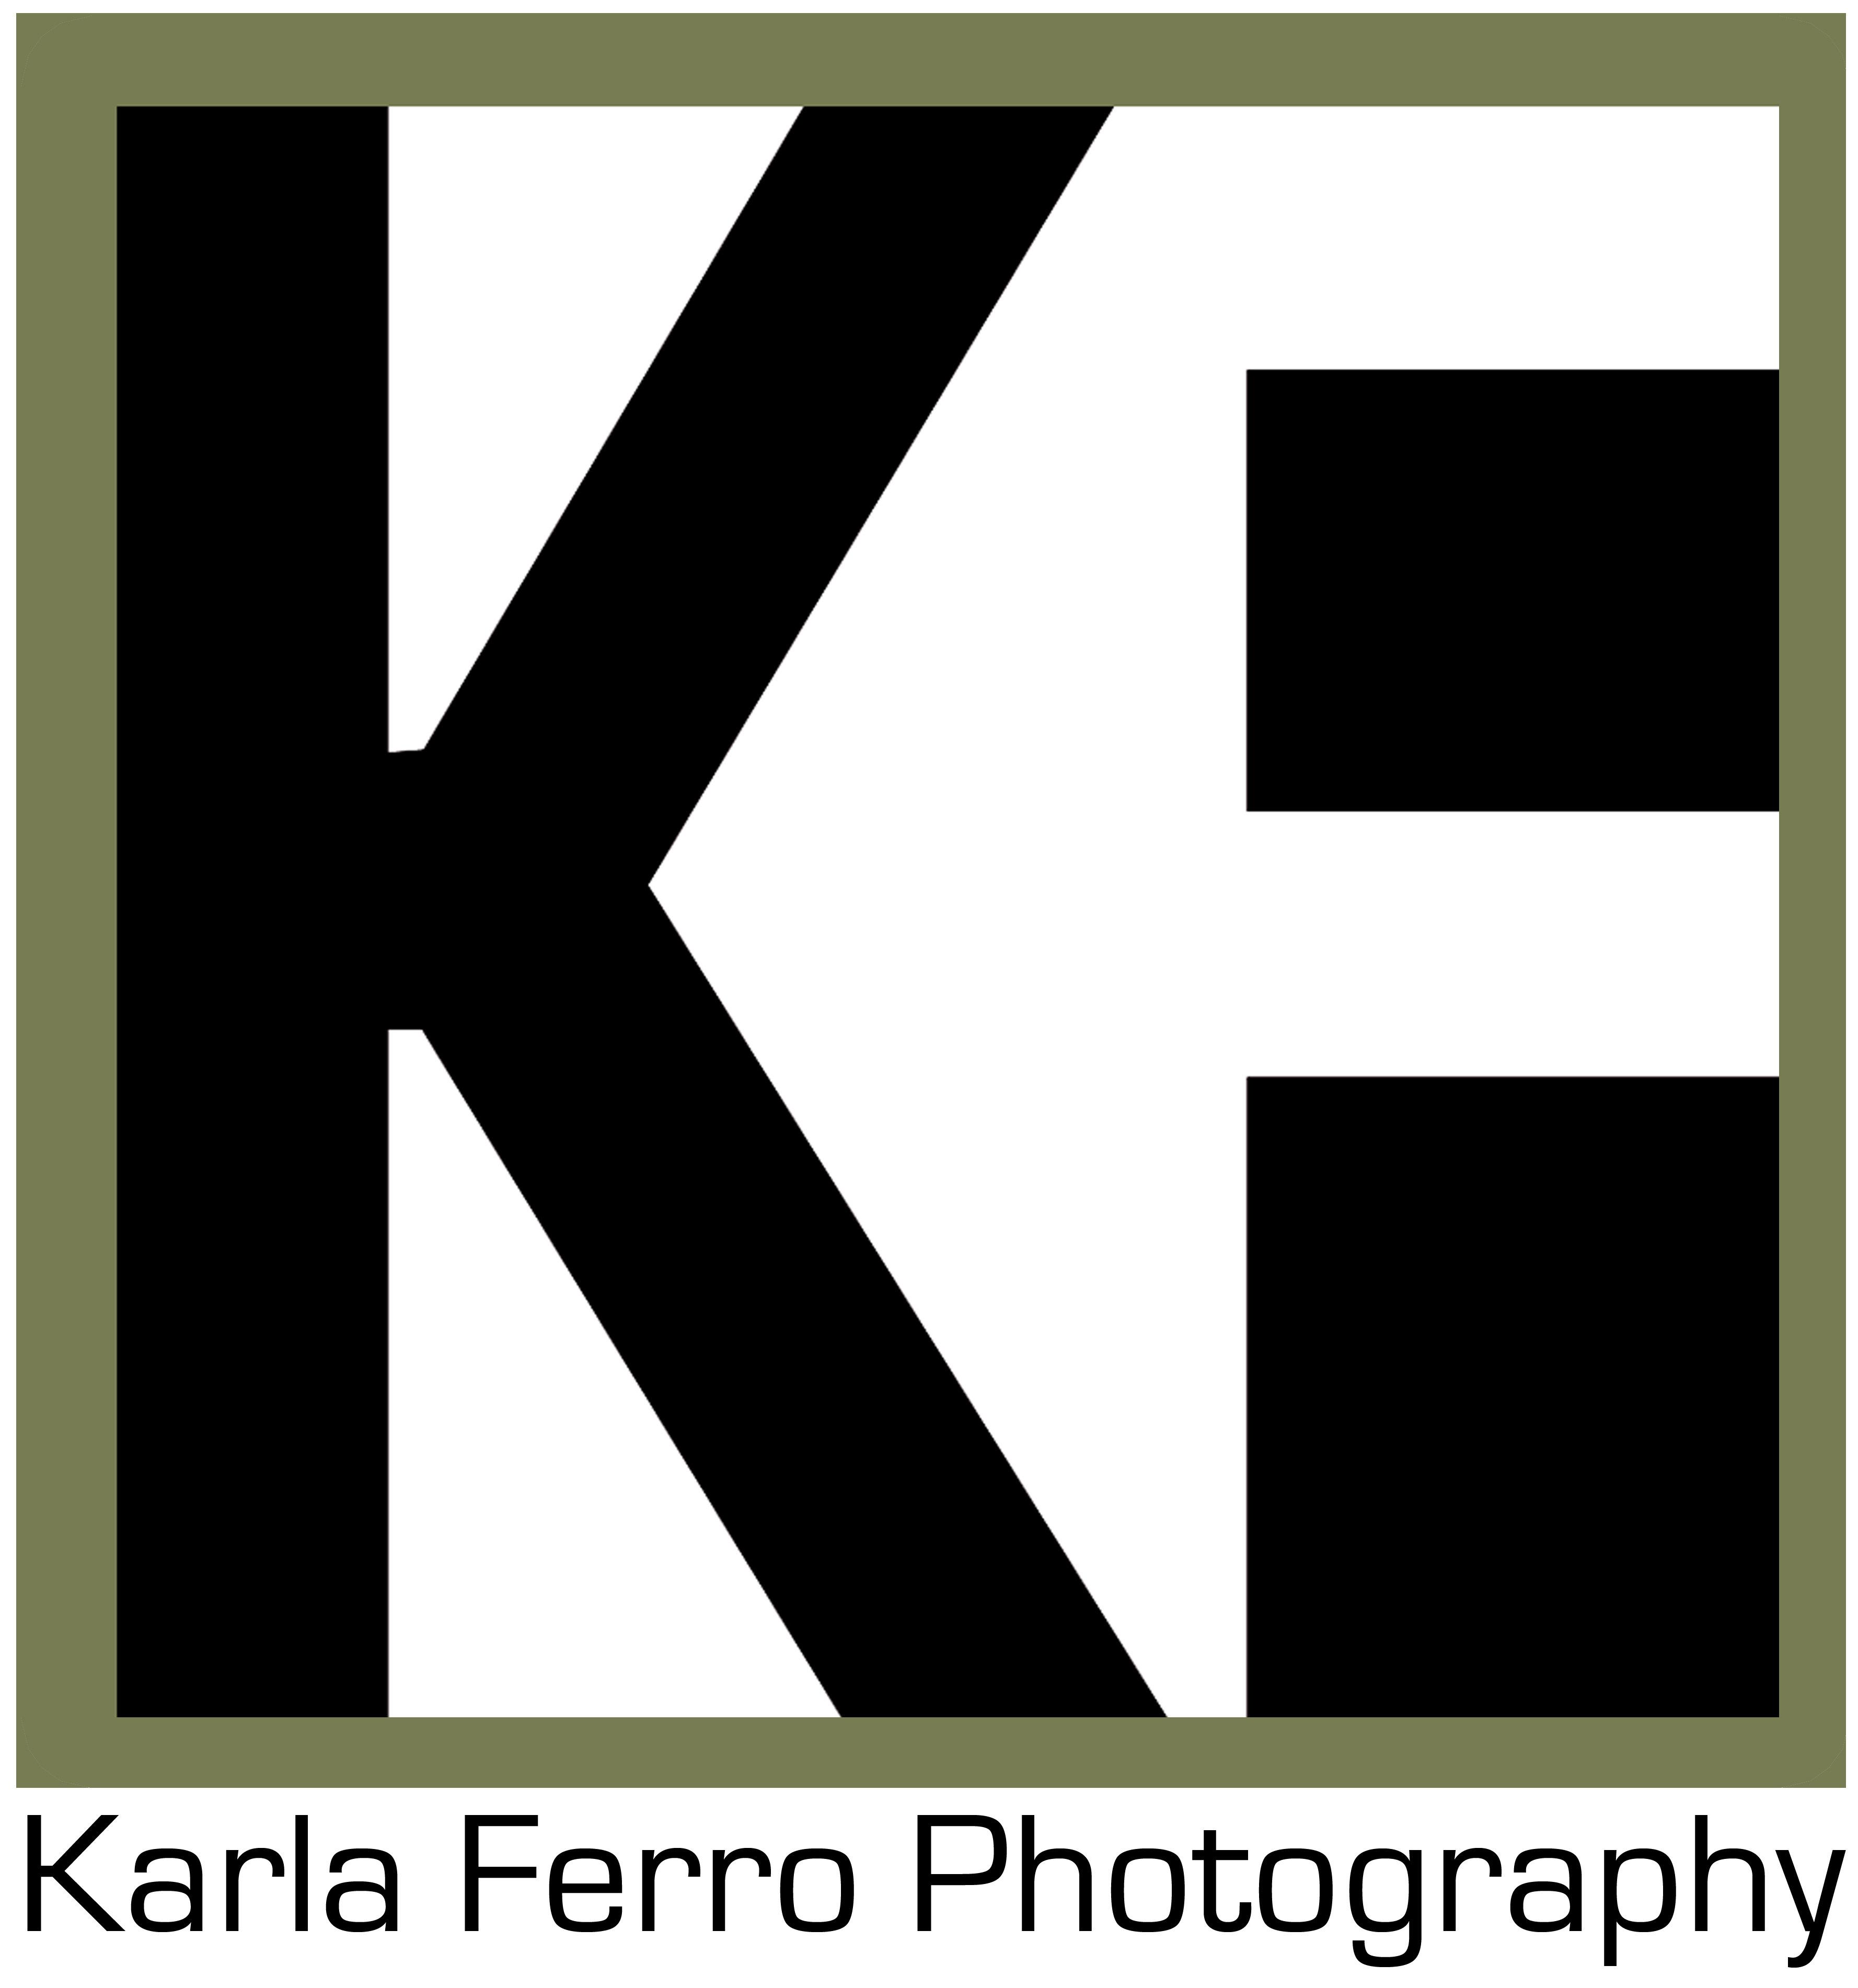 Karla Ferro